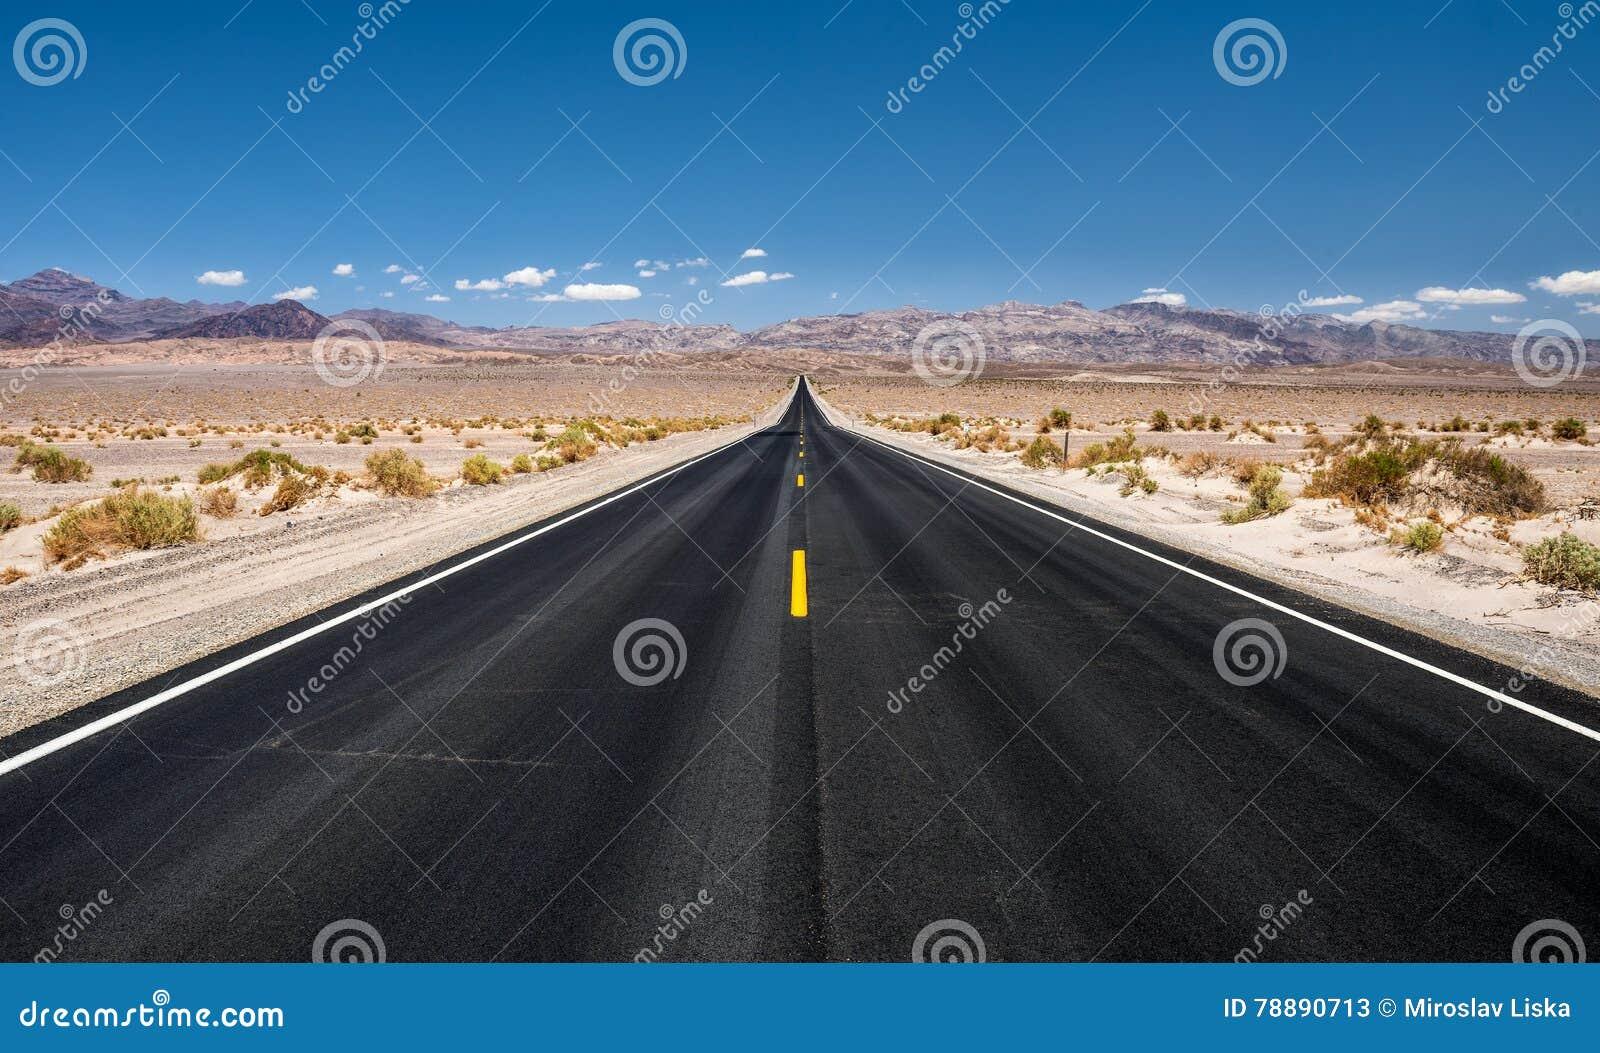 Empty road running through Death Valley National Park